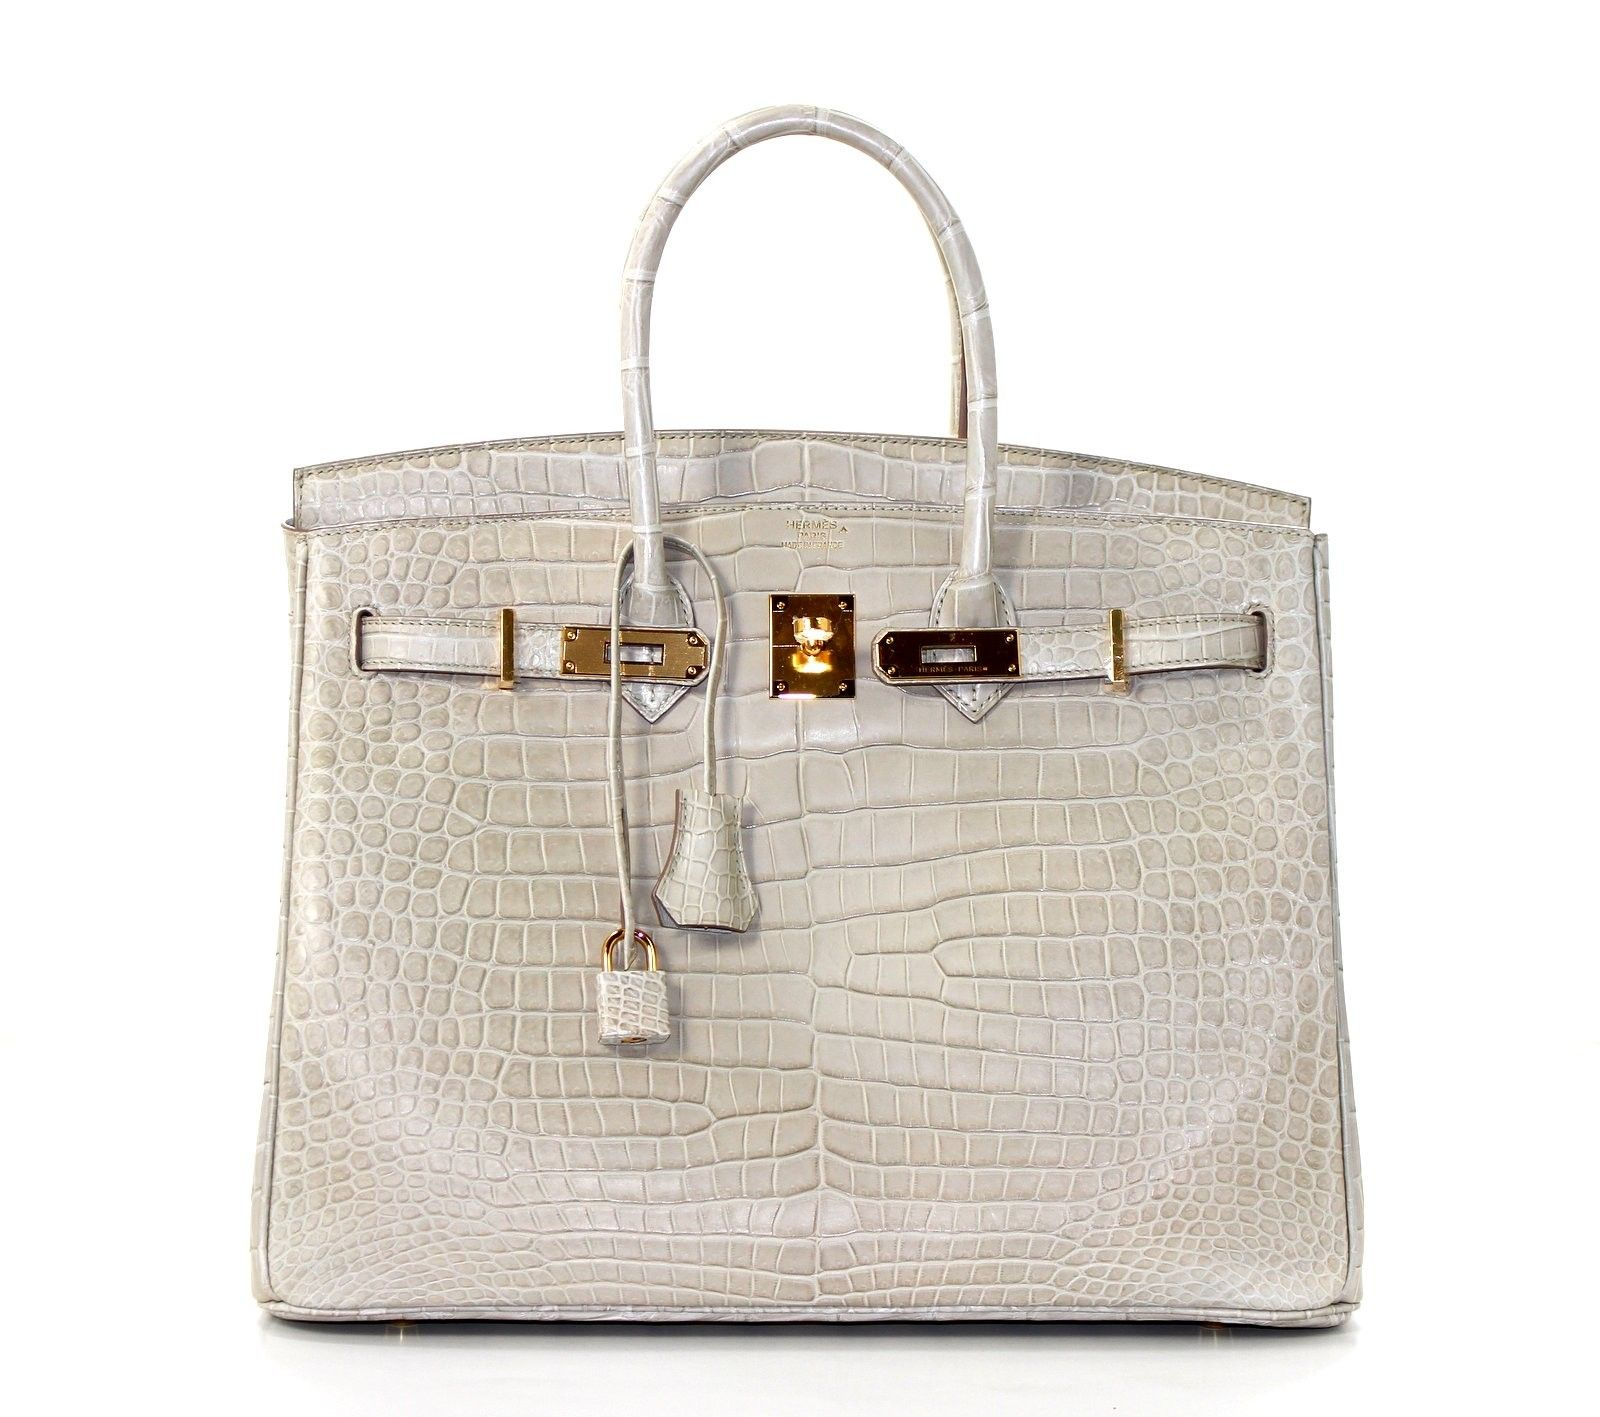 08ee4d3a8406 Hermès Beton Matte Porosus Crocodile Birkin Bag with Gold Hardware - Hermès  35 cm Beton Matte Porosus Croc Birkin- Never Carried